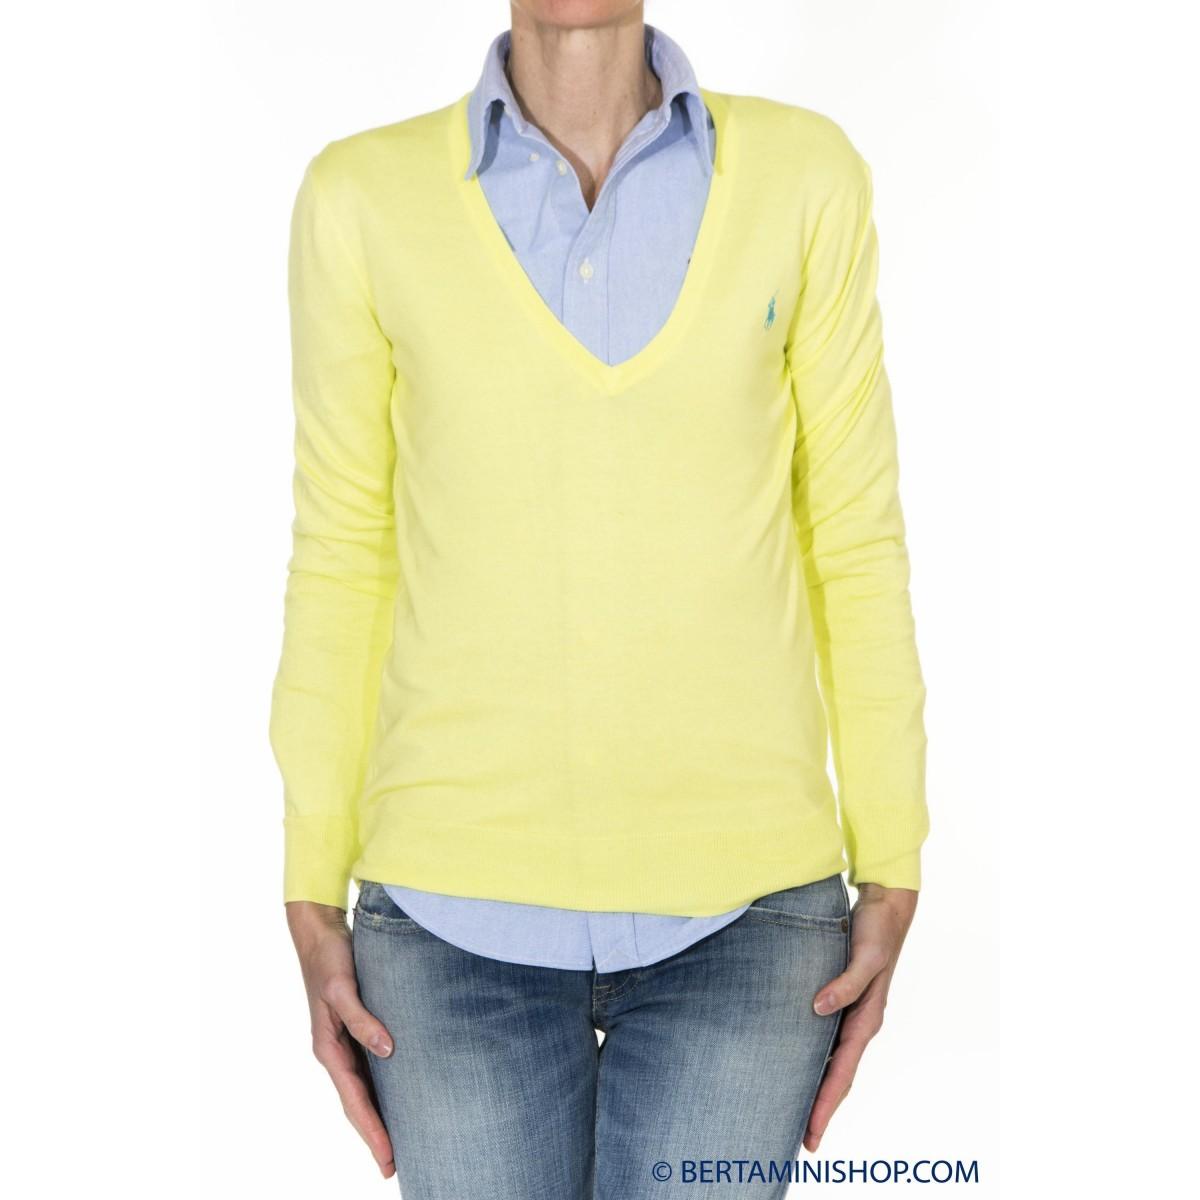 Sweater Ralph Lauren Damen - V39Ih635Bh635 B4H25 - Blu